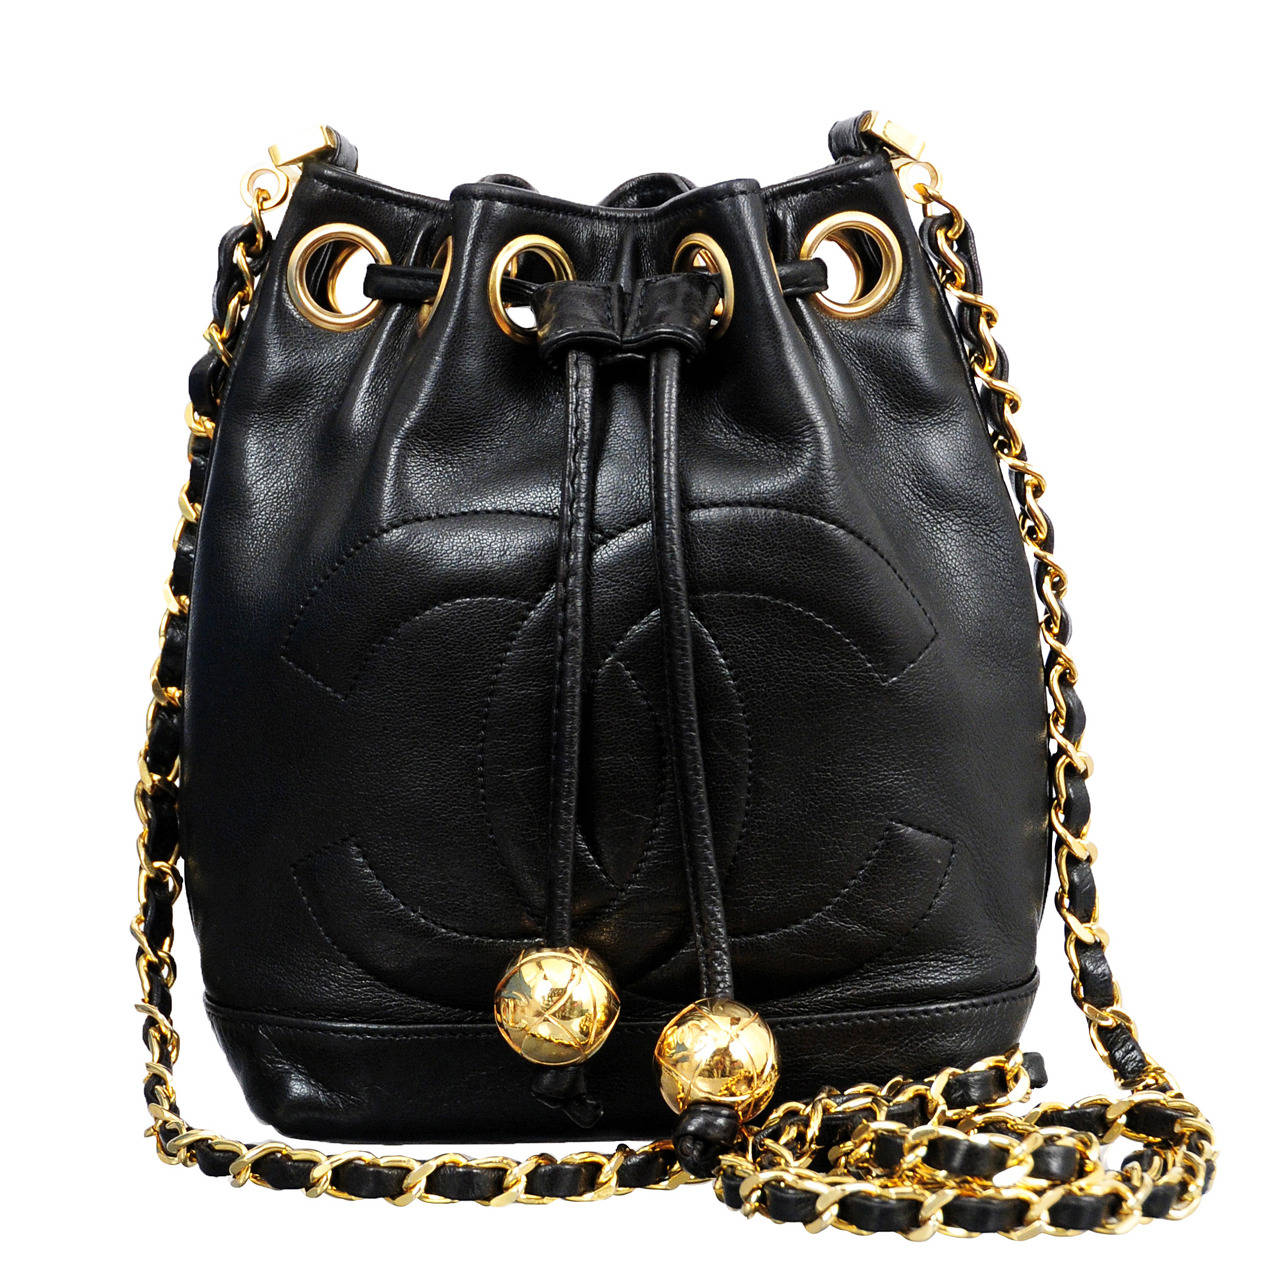 Chanel Black Lambskin Mini Bucket Bag For